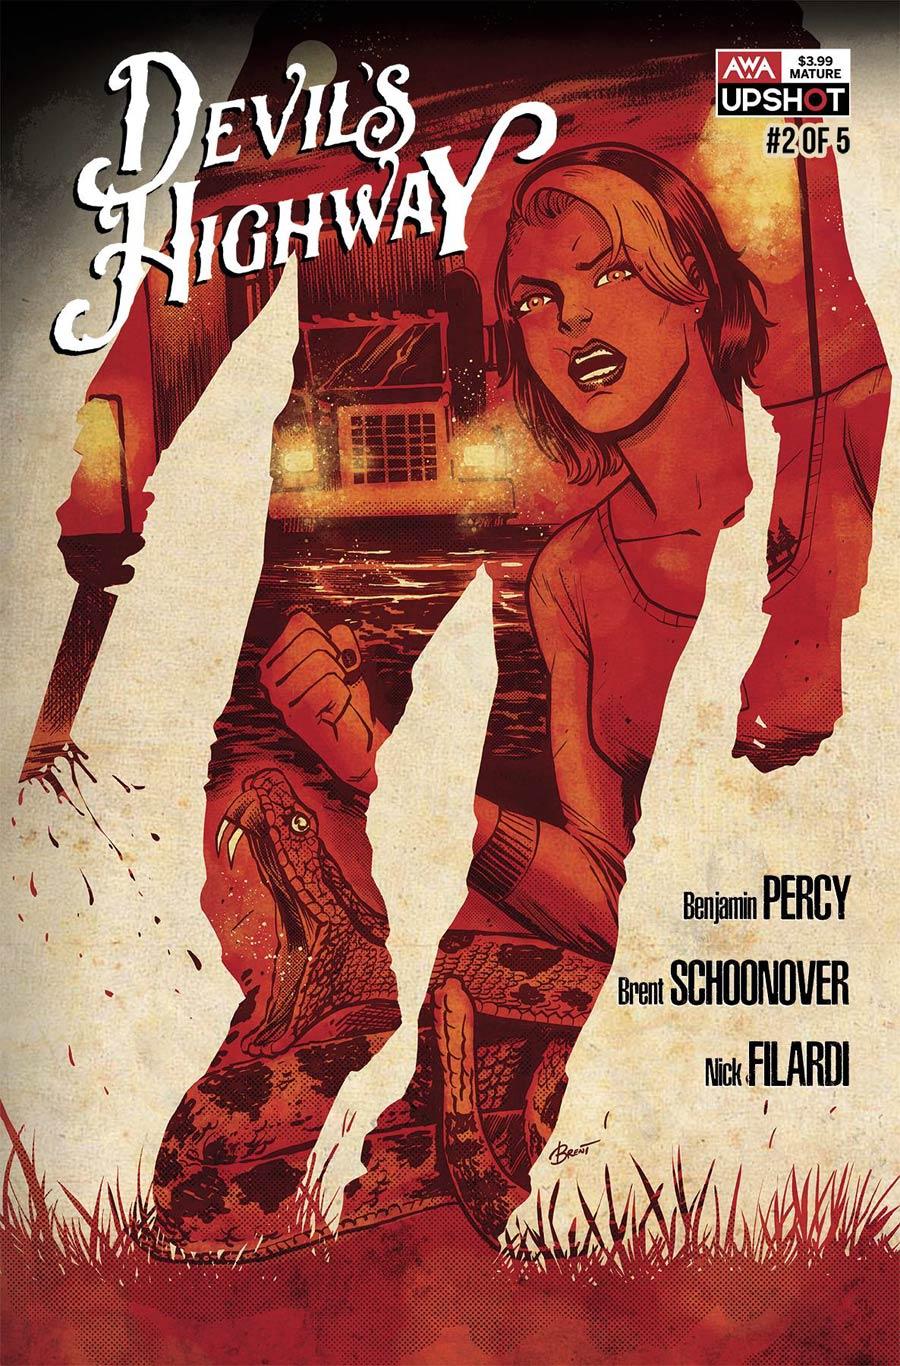 Devils Highway #2 (2020)